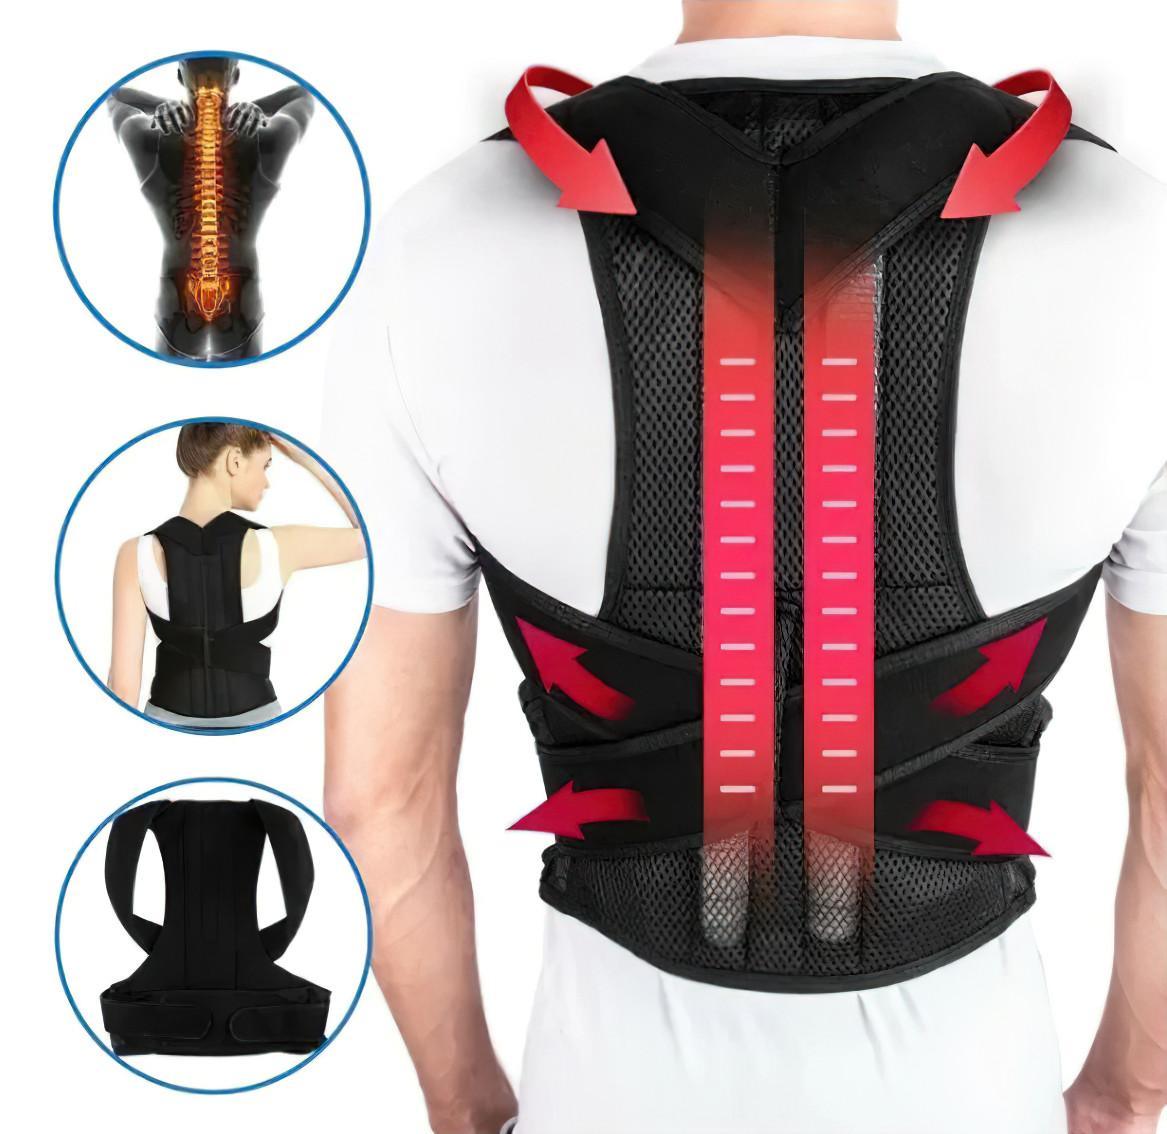 Ортопедический корсет для коррекции осанки Back Pain Help Support Belt корректор Размер XXL (ST)